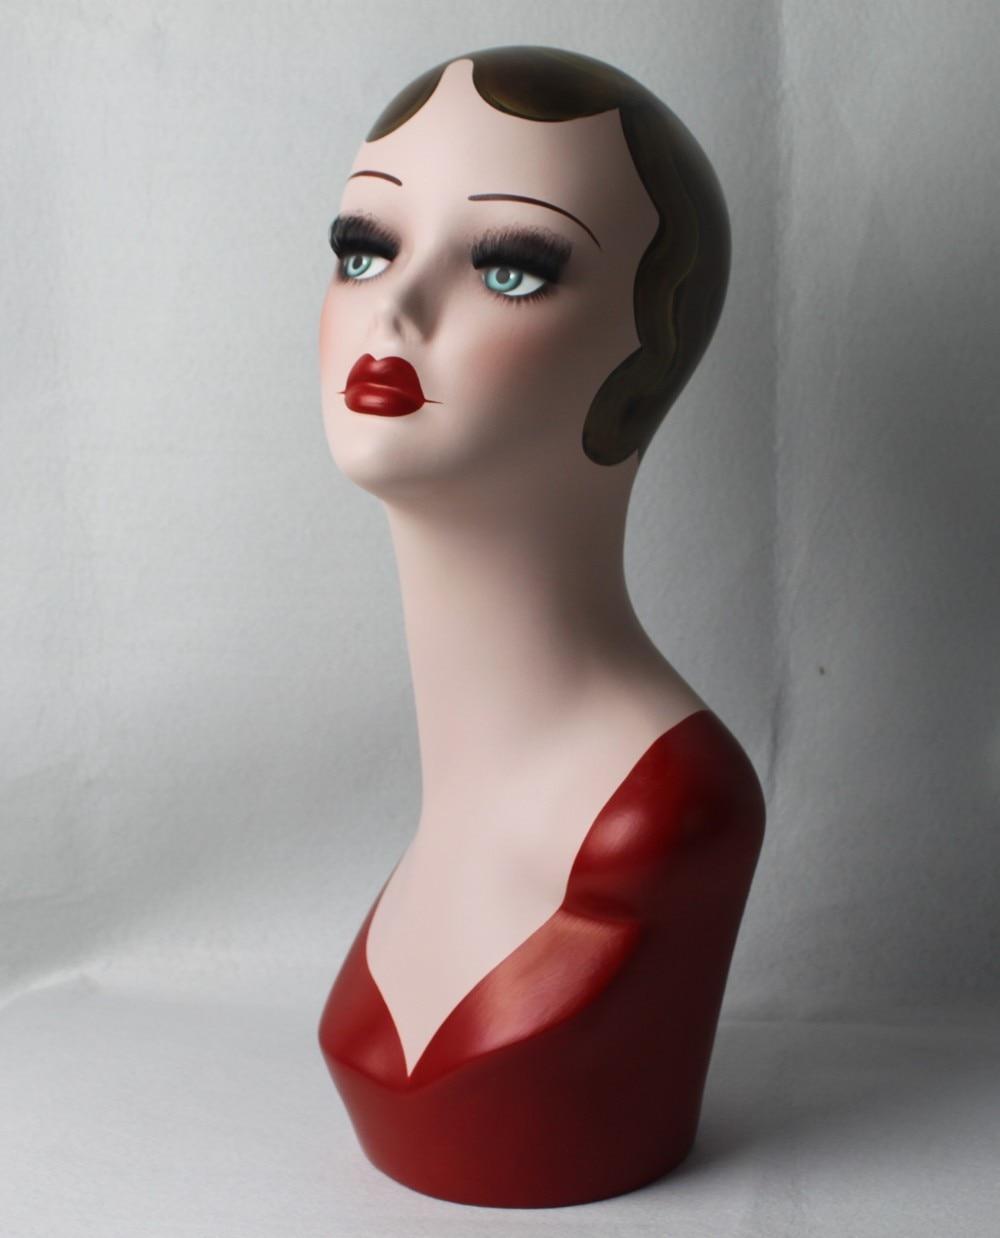 High Quality Fiberglass Vintage Female Mannequin Dummy Head HatHigh Quality Fiberglass Vintage Female Mannequin Dummy Head Hat